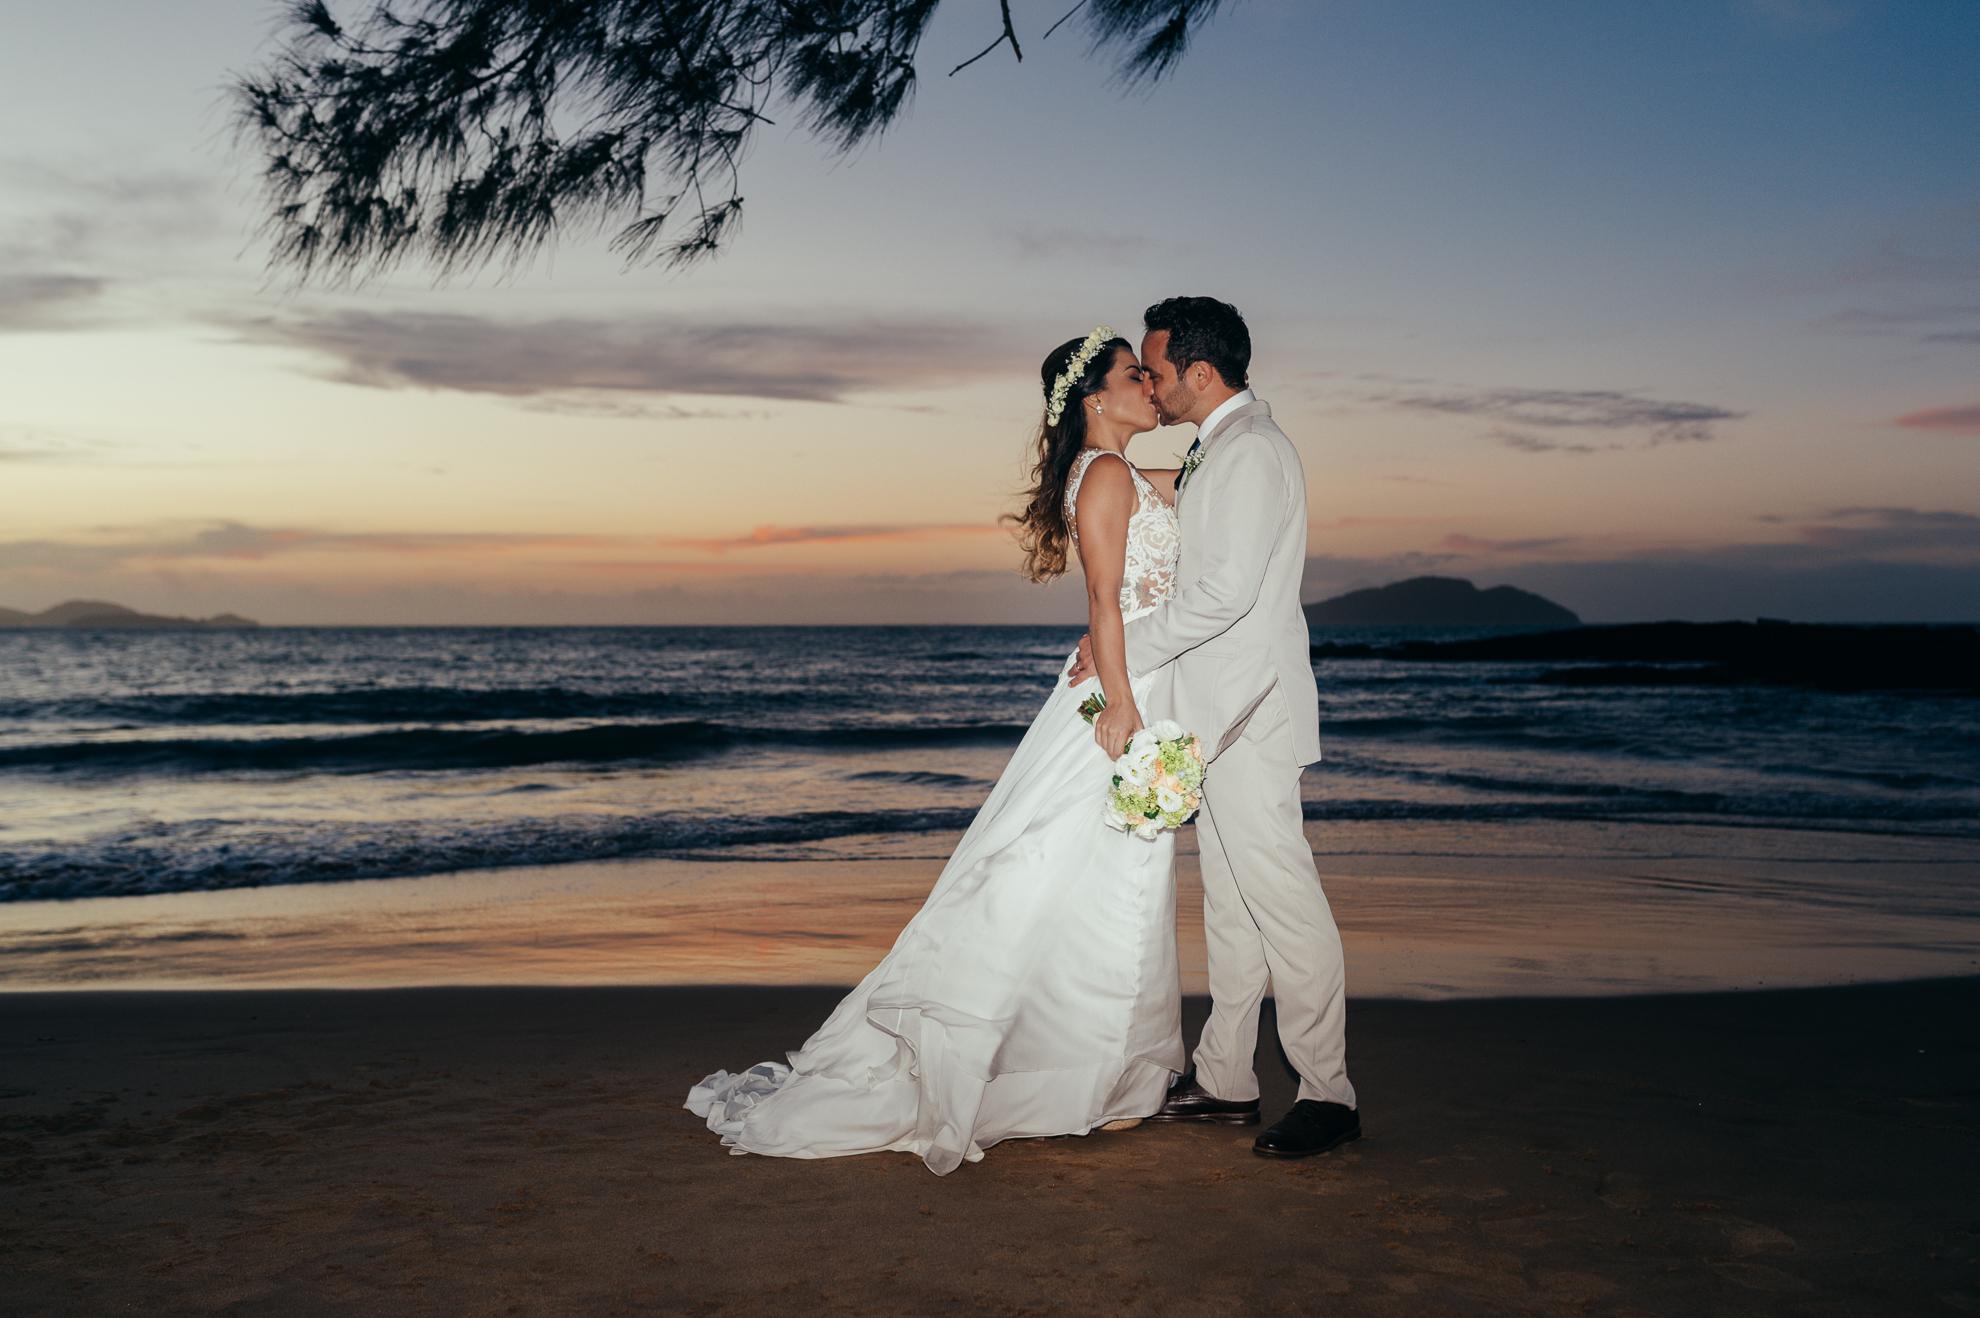 Pousada Praia da Tartaruga - Priscila & Guilherme (87)